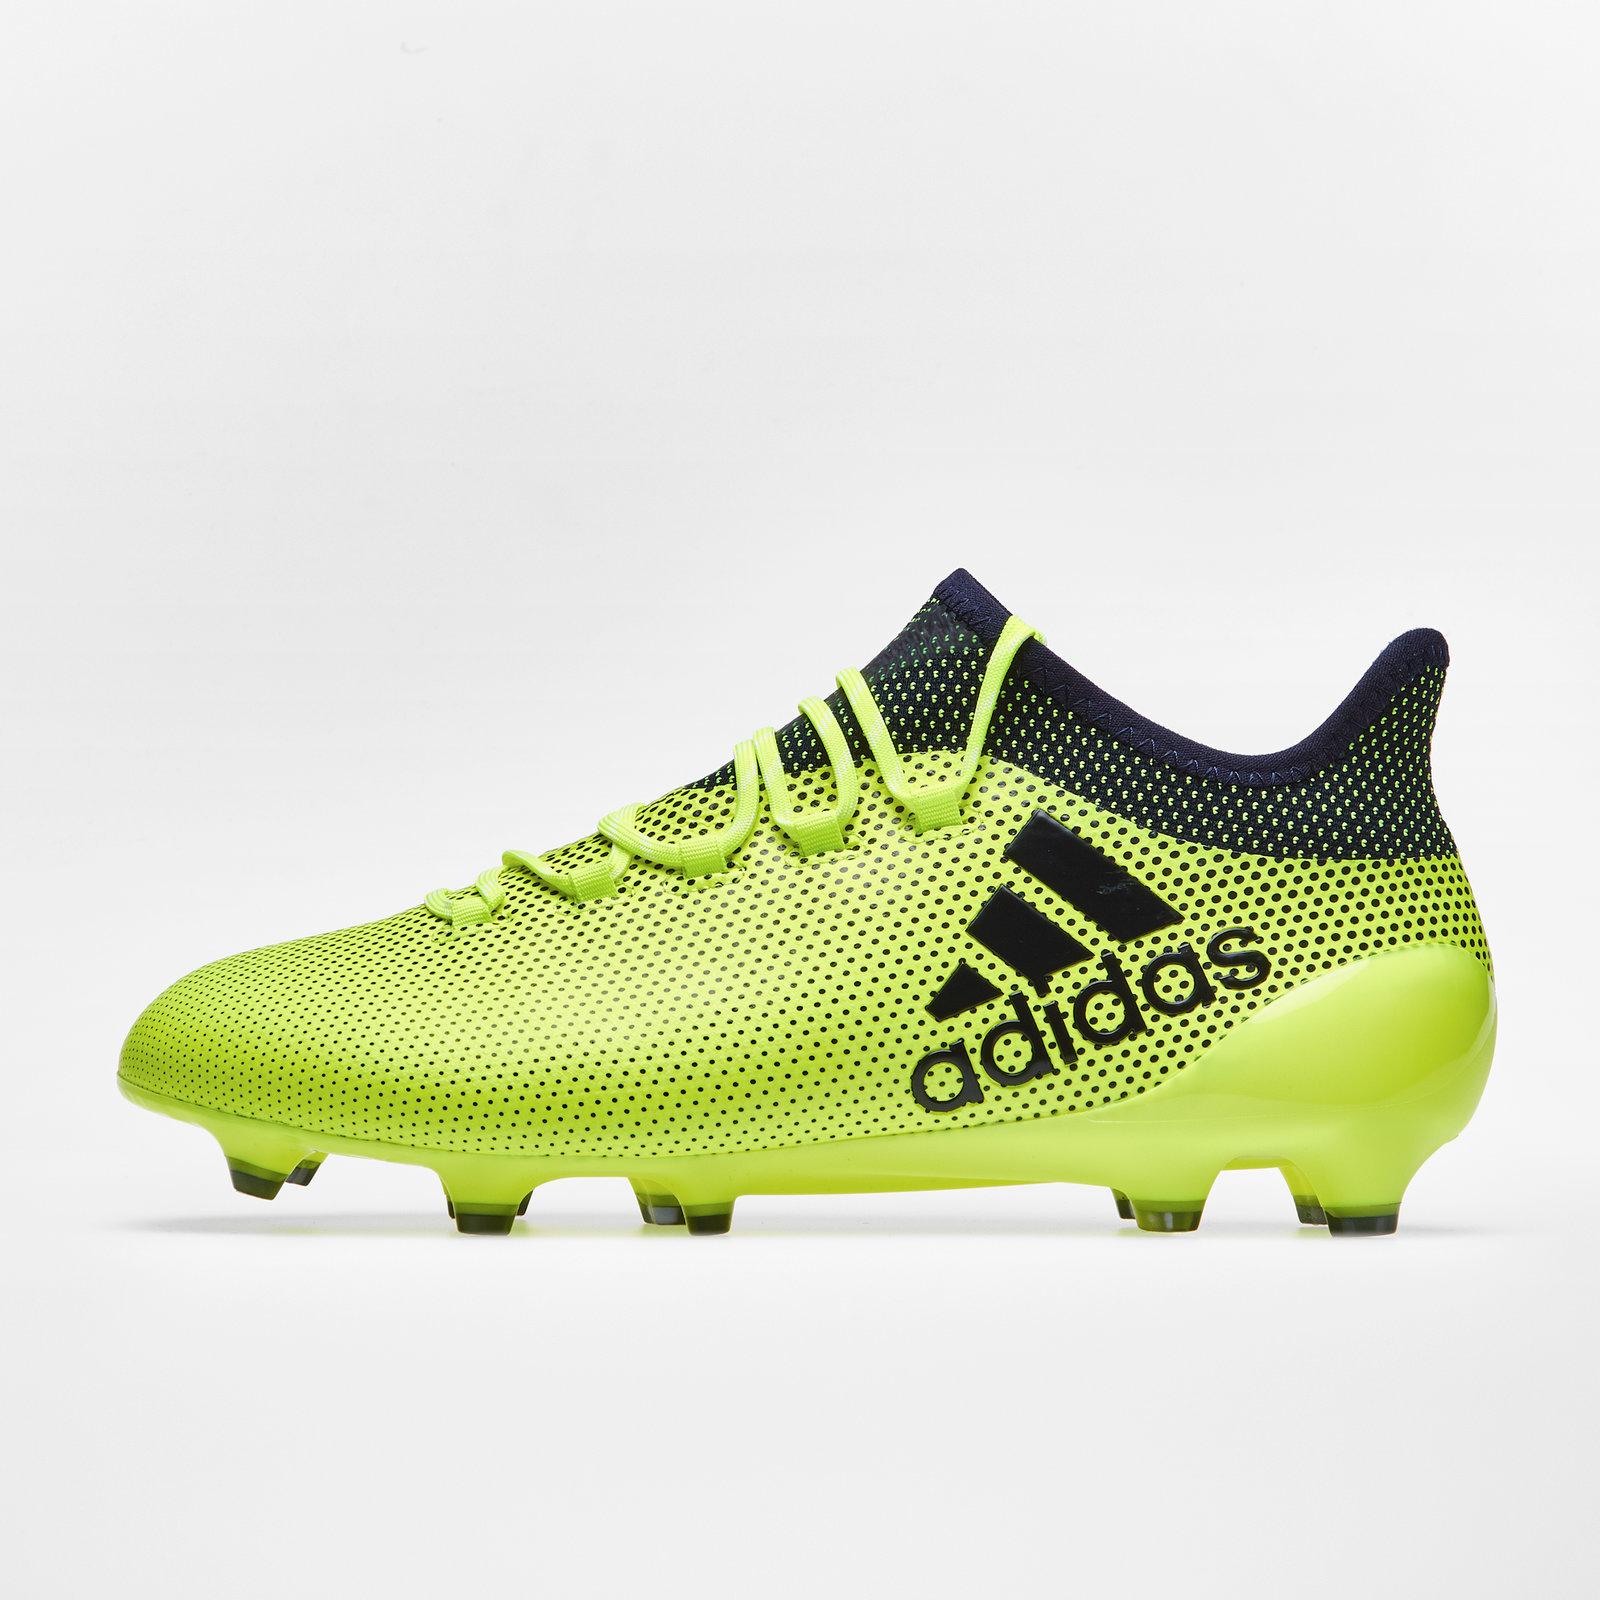 90d9de69c1fa Adidas Ocean Storm Pack | New Adidas Boots | Newest Adidas Boots